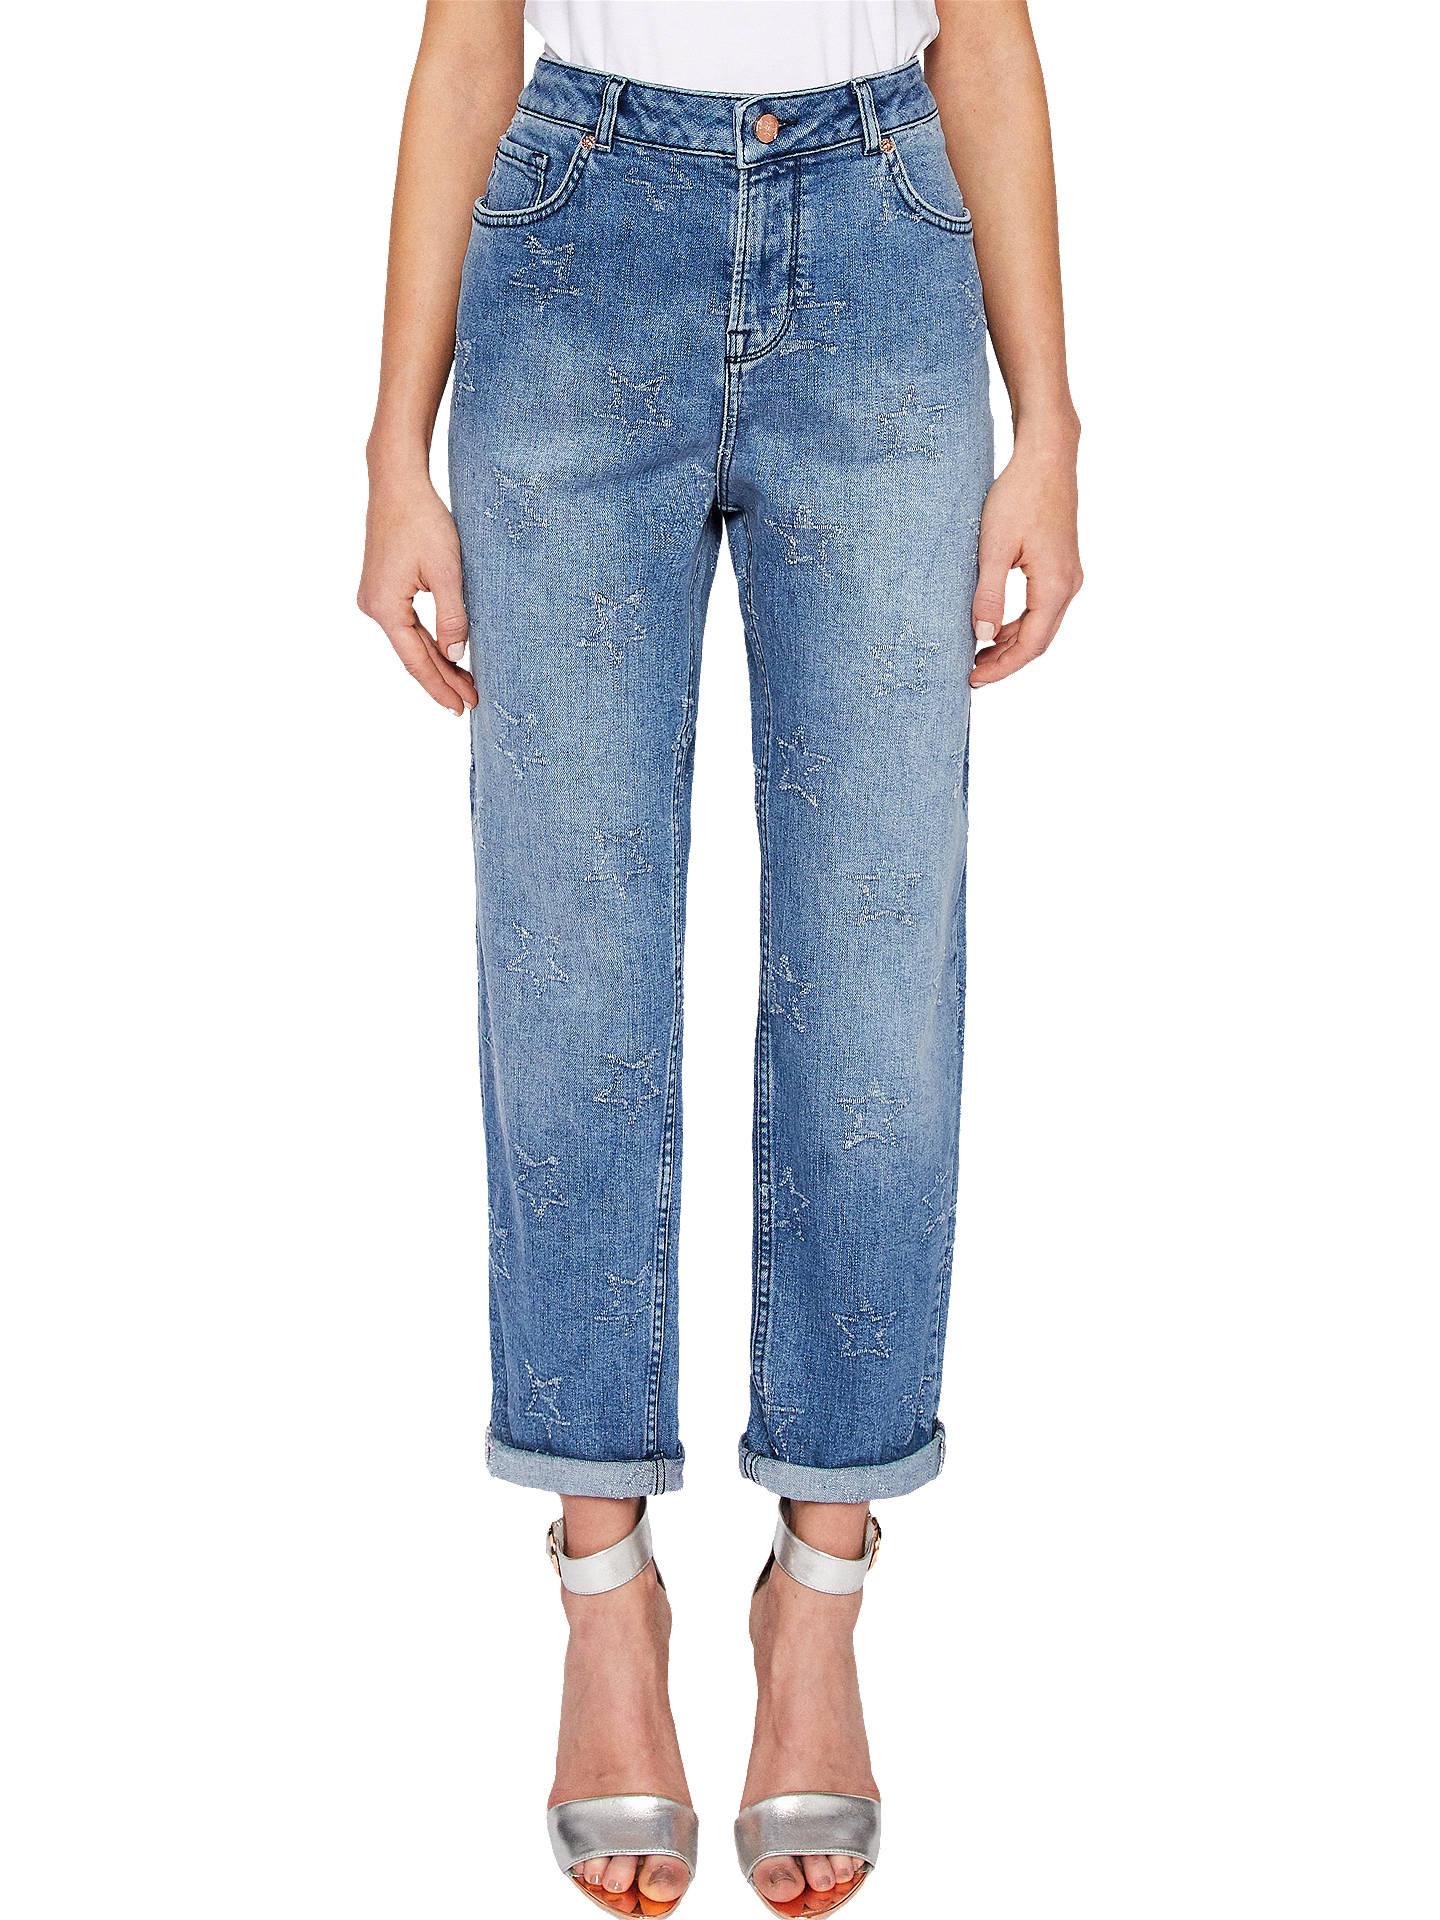 f9cd43649b6 Buy Ted Baker Lurra Star Abrasion Boyfriend Jeans, Blue, 26 Online at  johnlewis.